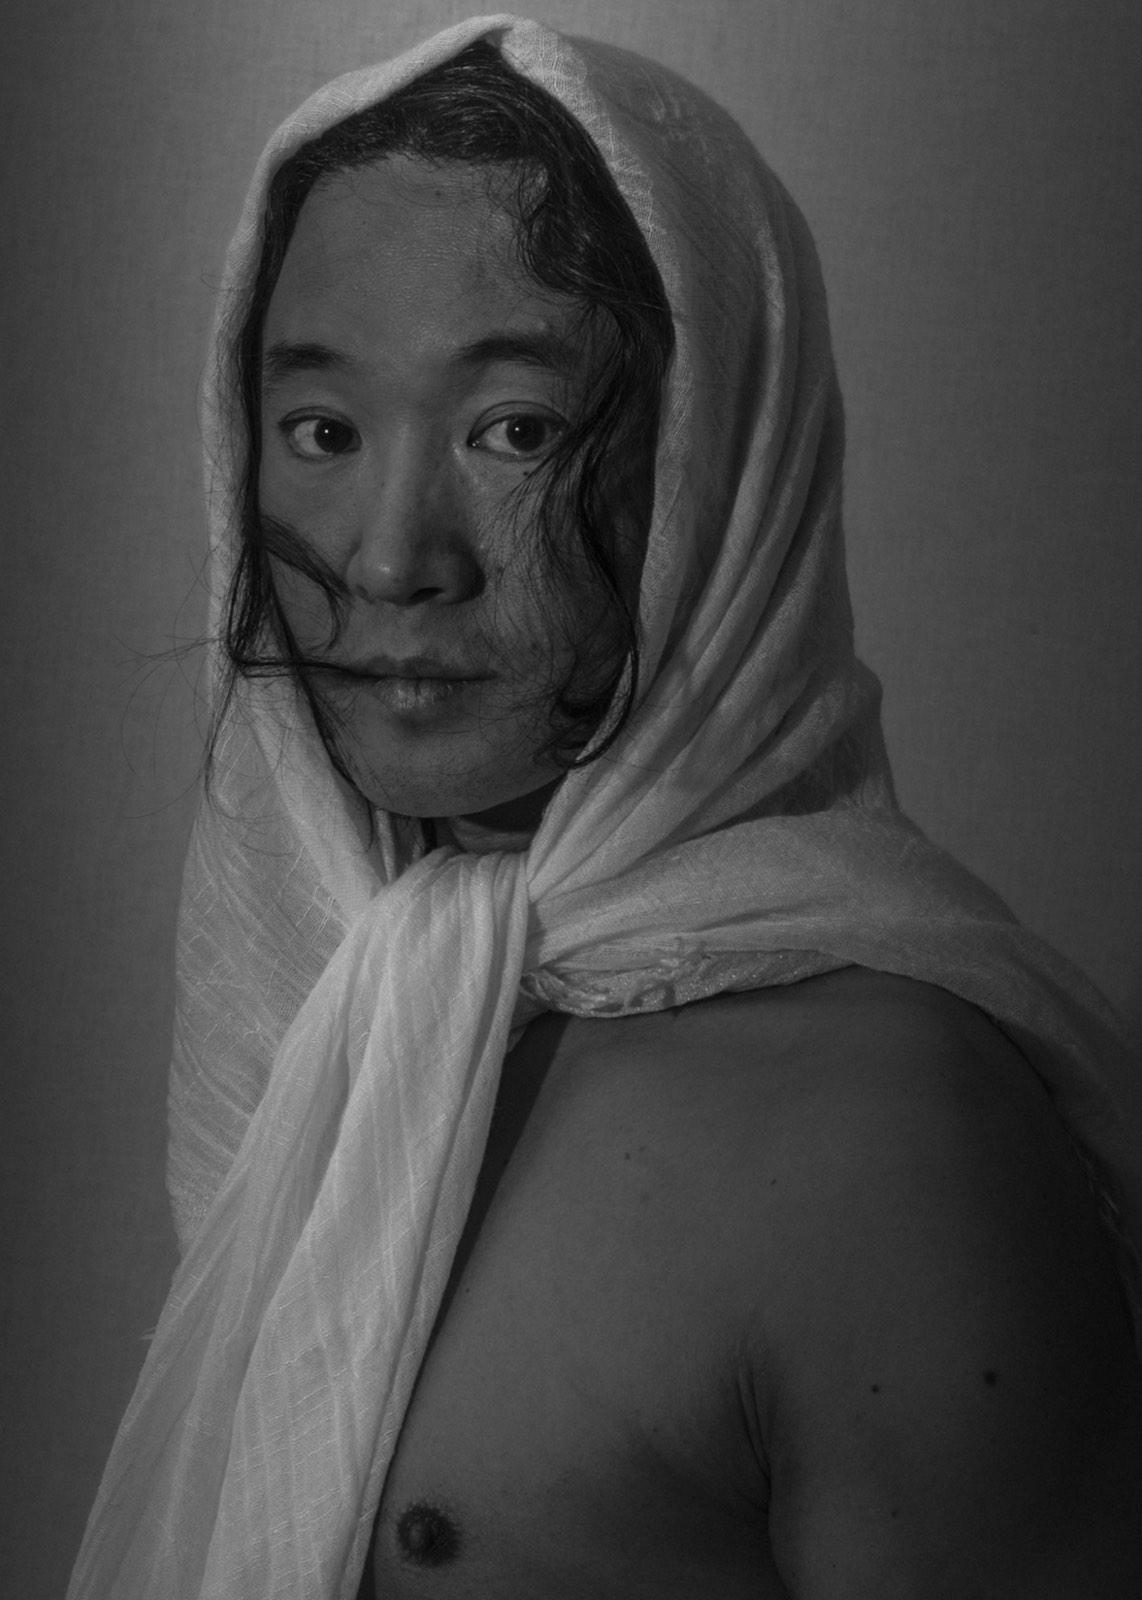 Foto van Mona Alikah van man met doek om hoofd